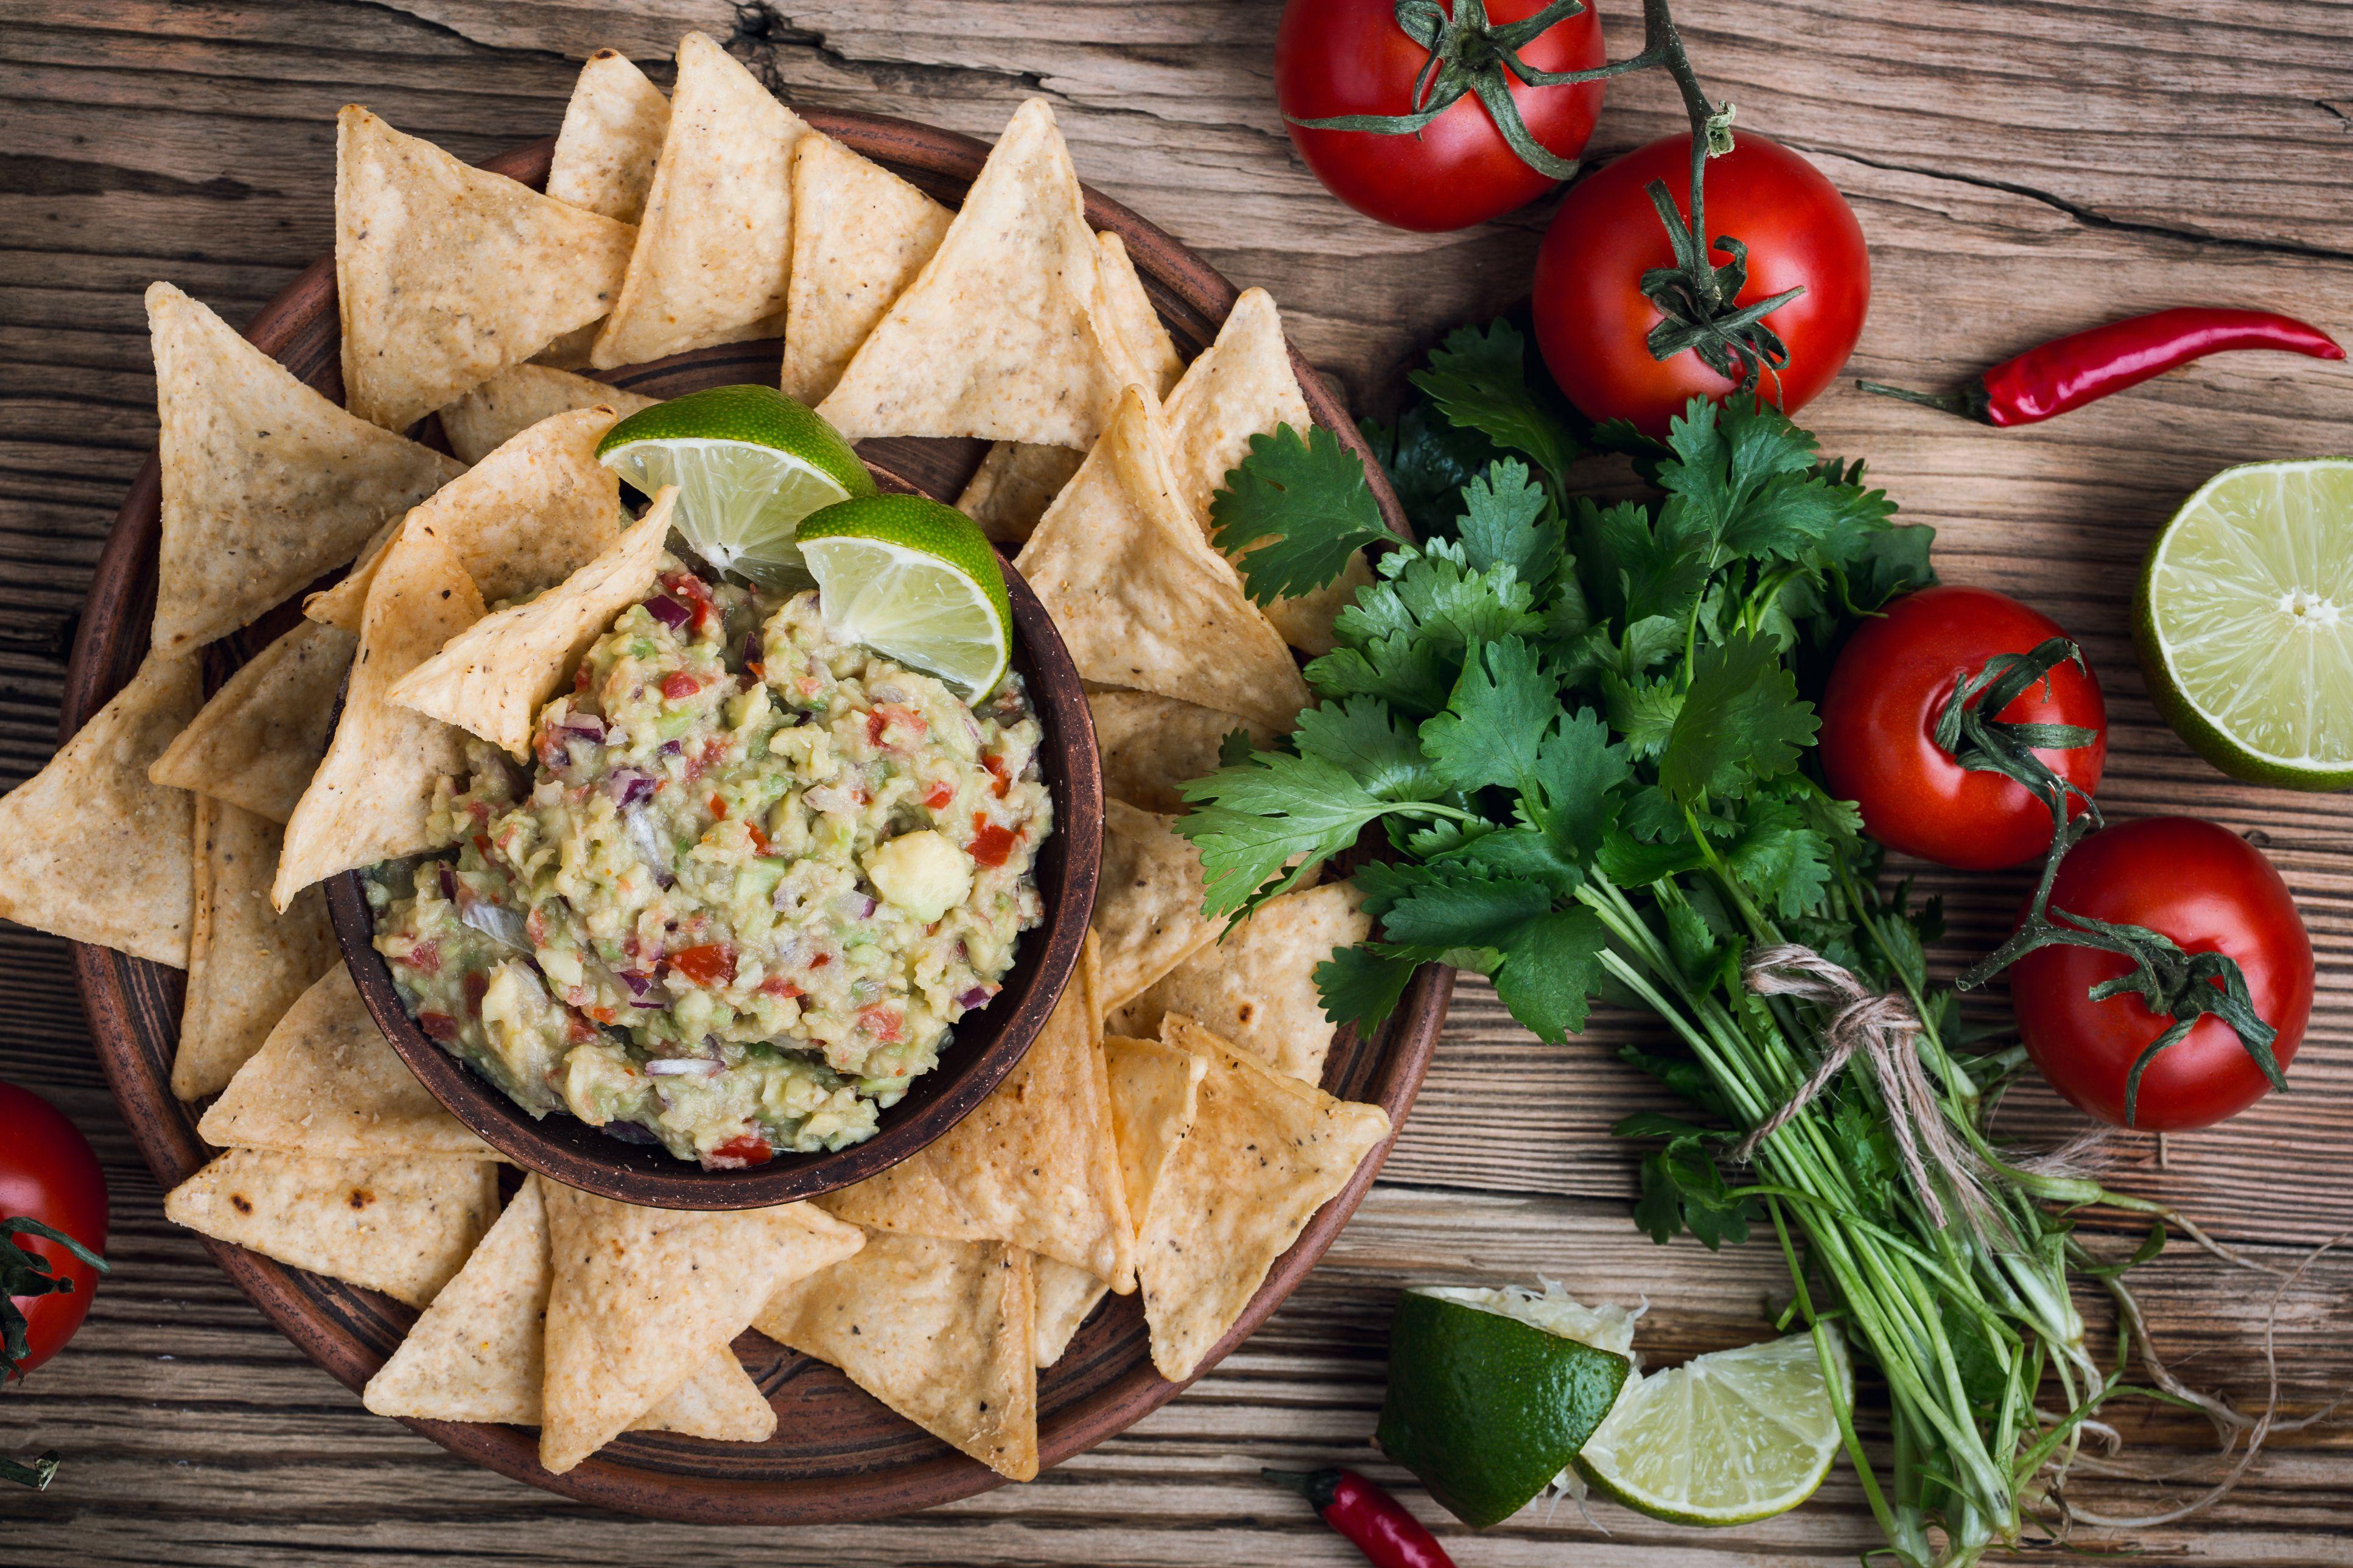 Gluten-Free Potato Chips and Multigrain Chips